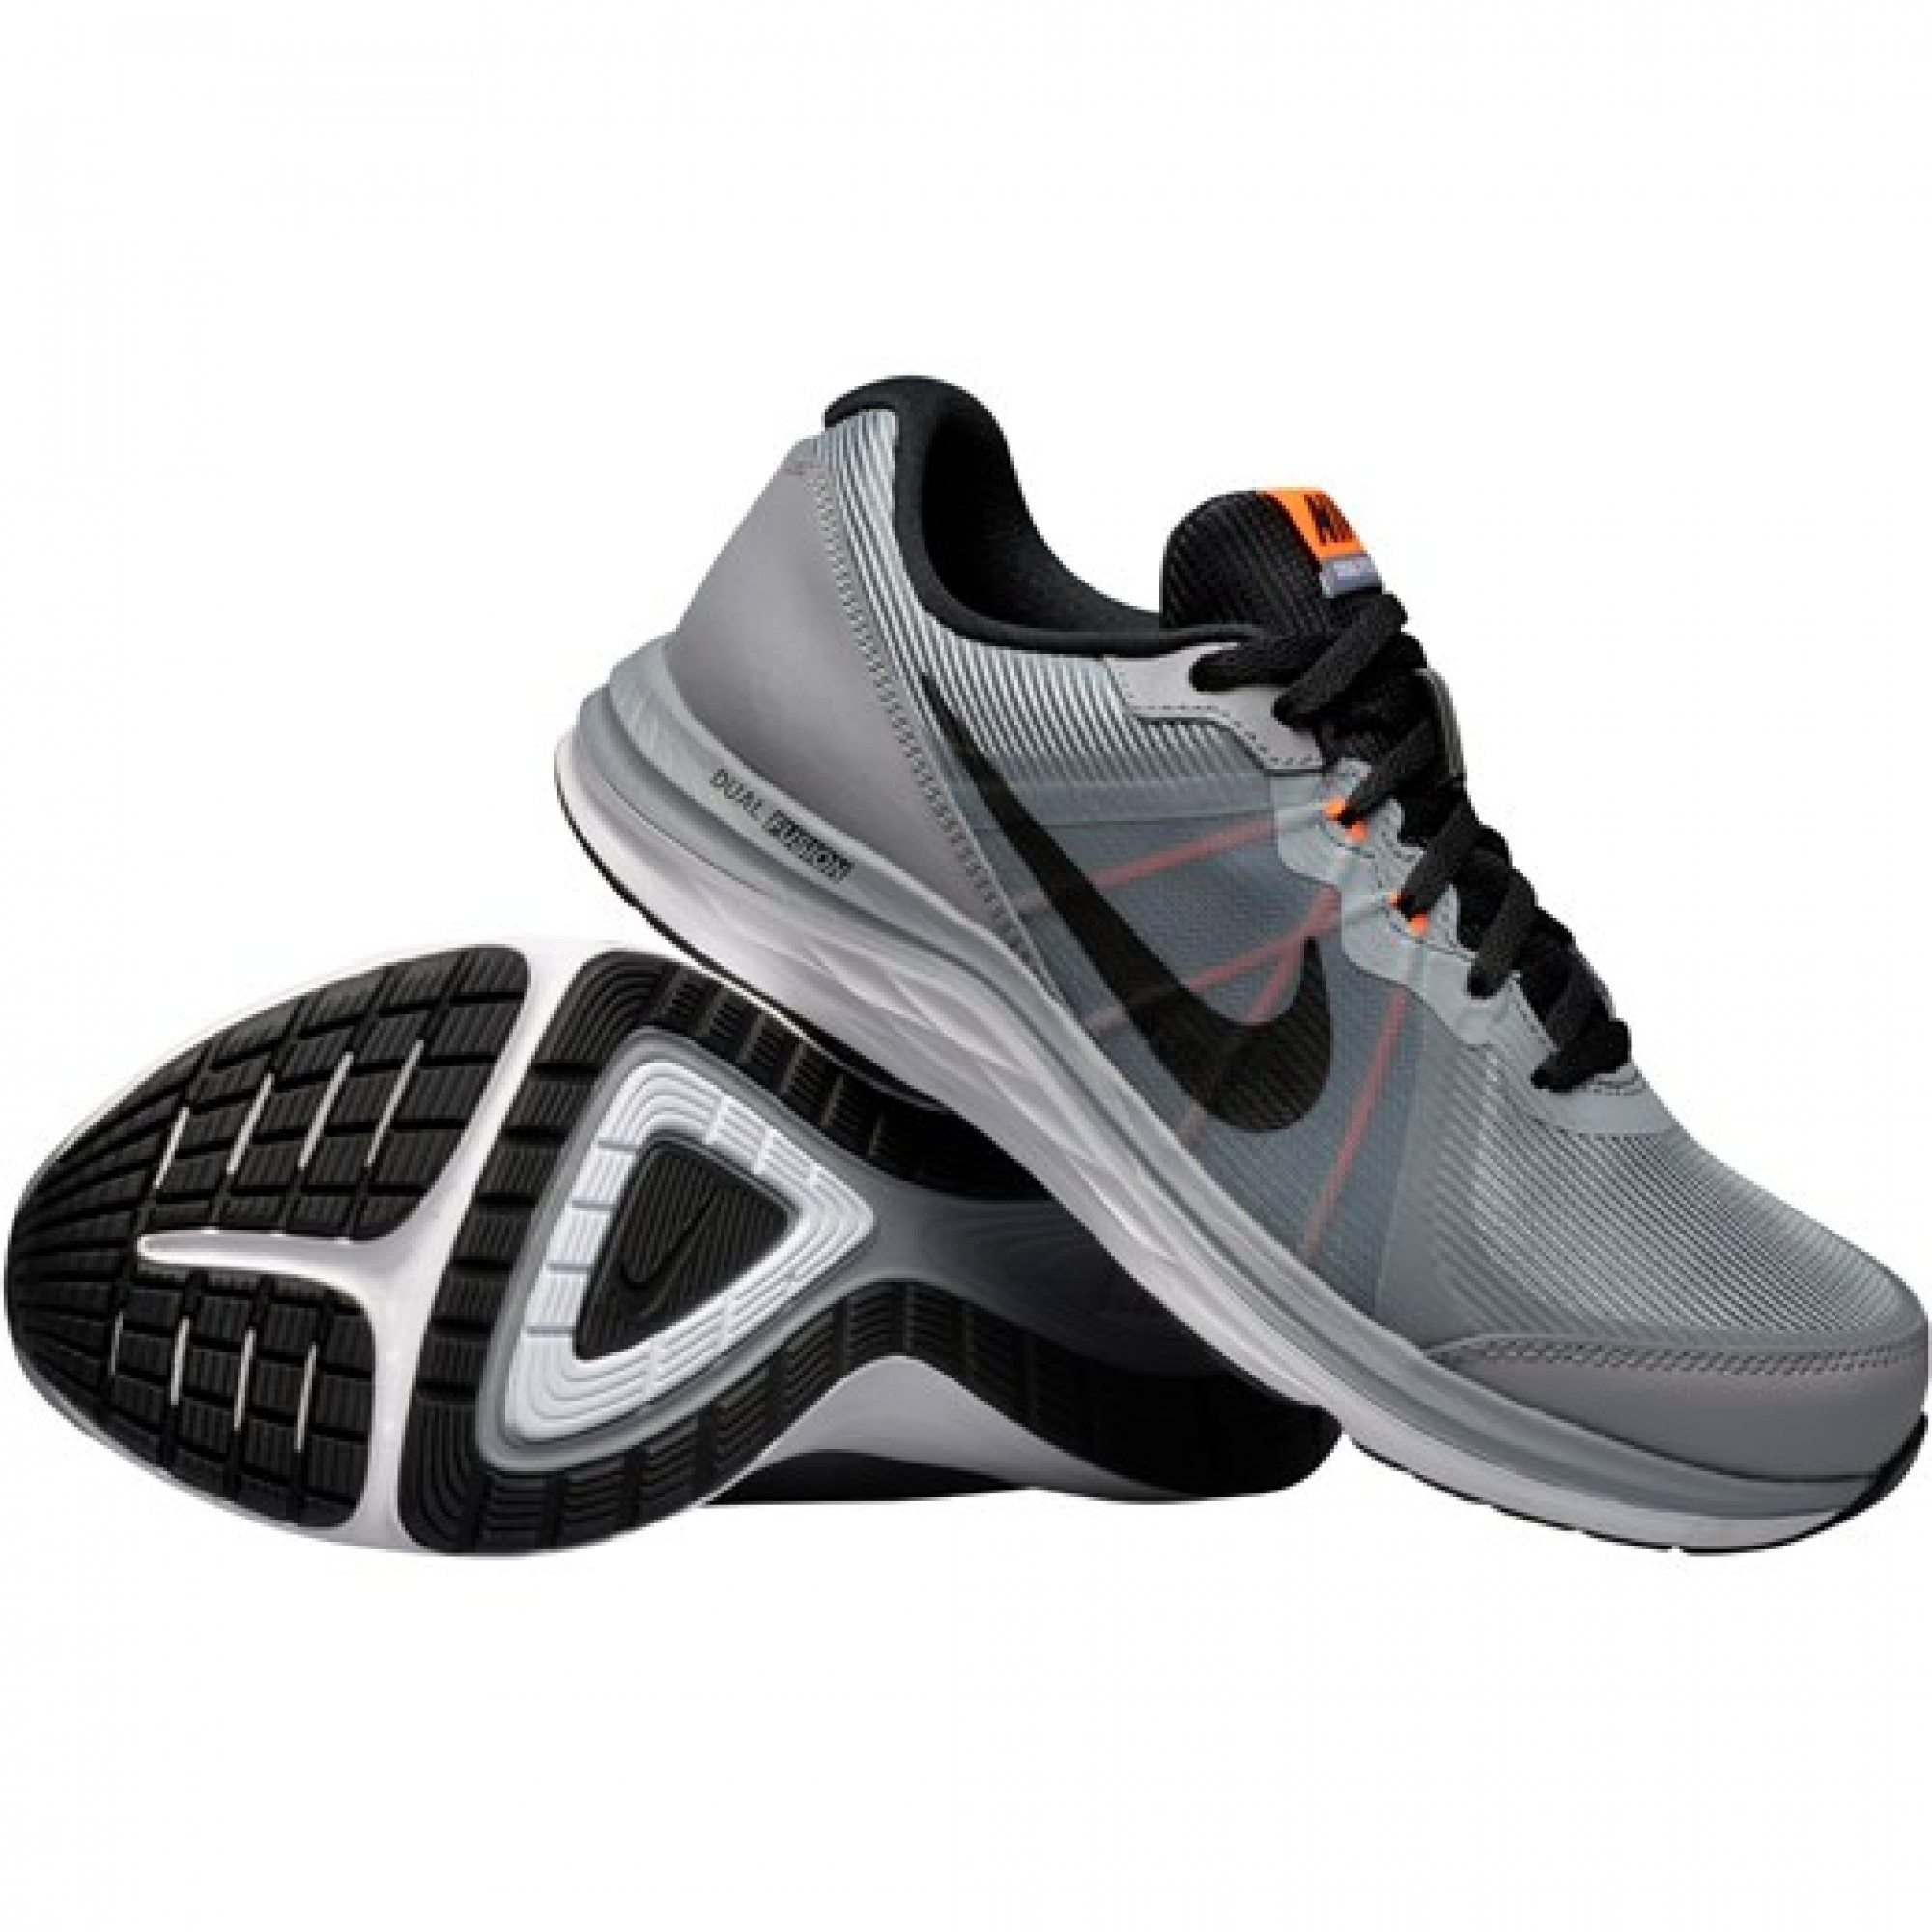 c003a0987f54 Kids Nike Dual Fusion X 2 GS 820305-005 Παιδικό Γκρι